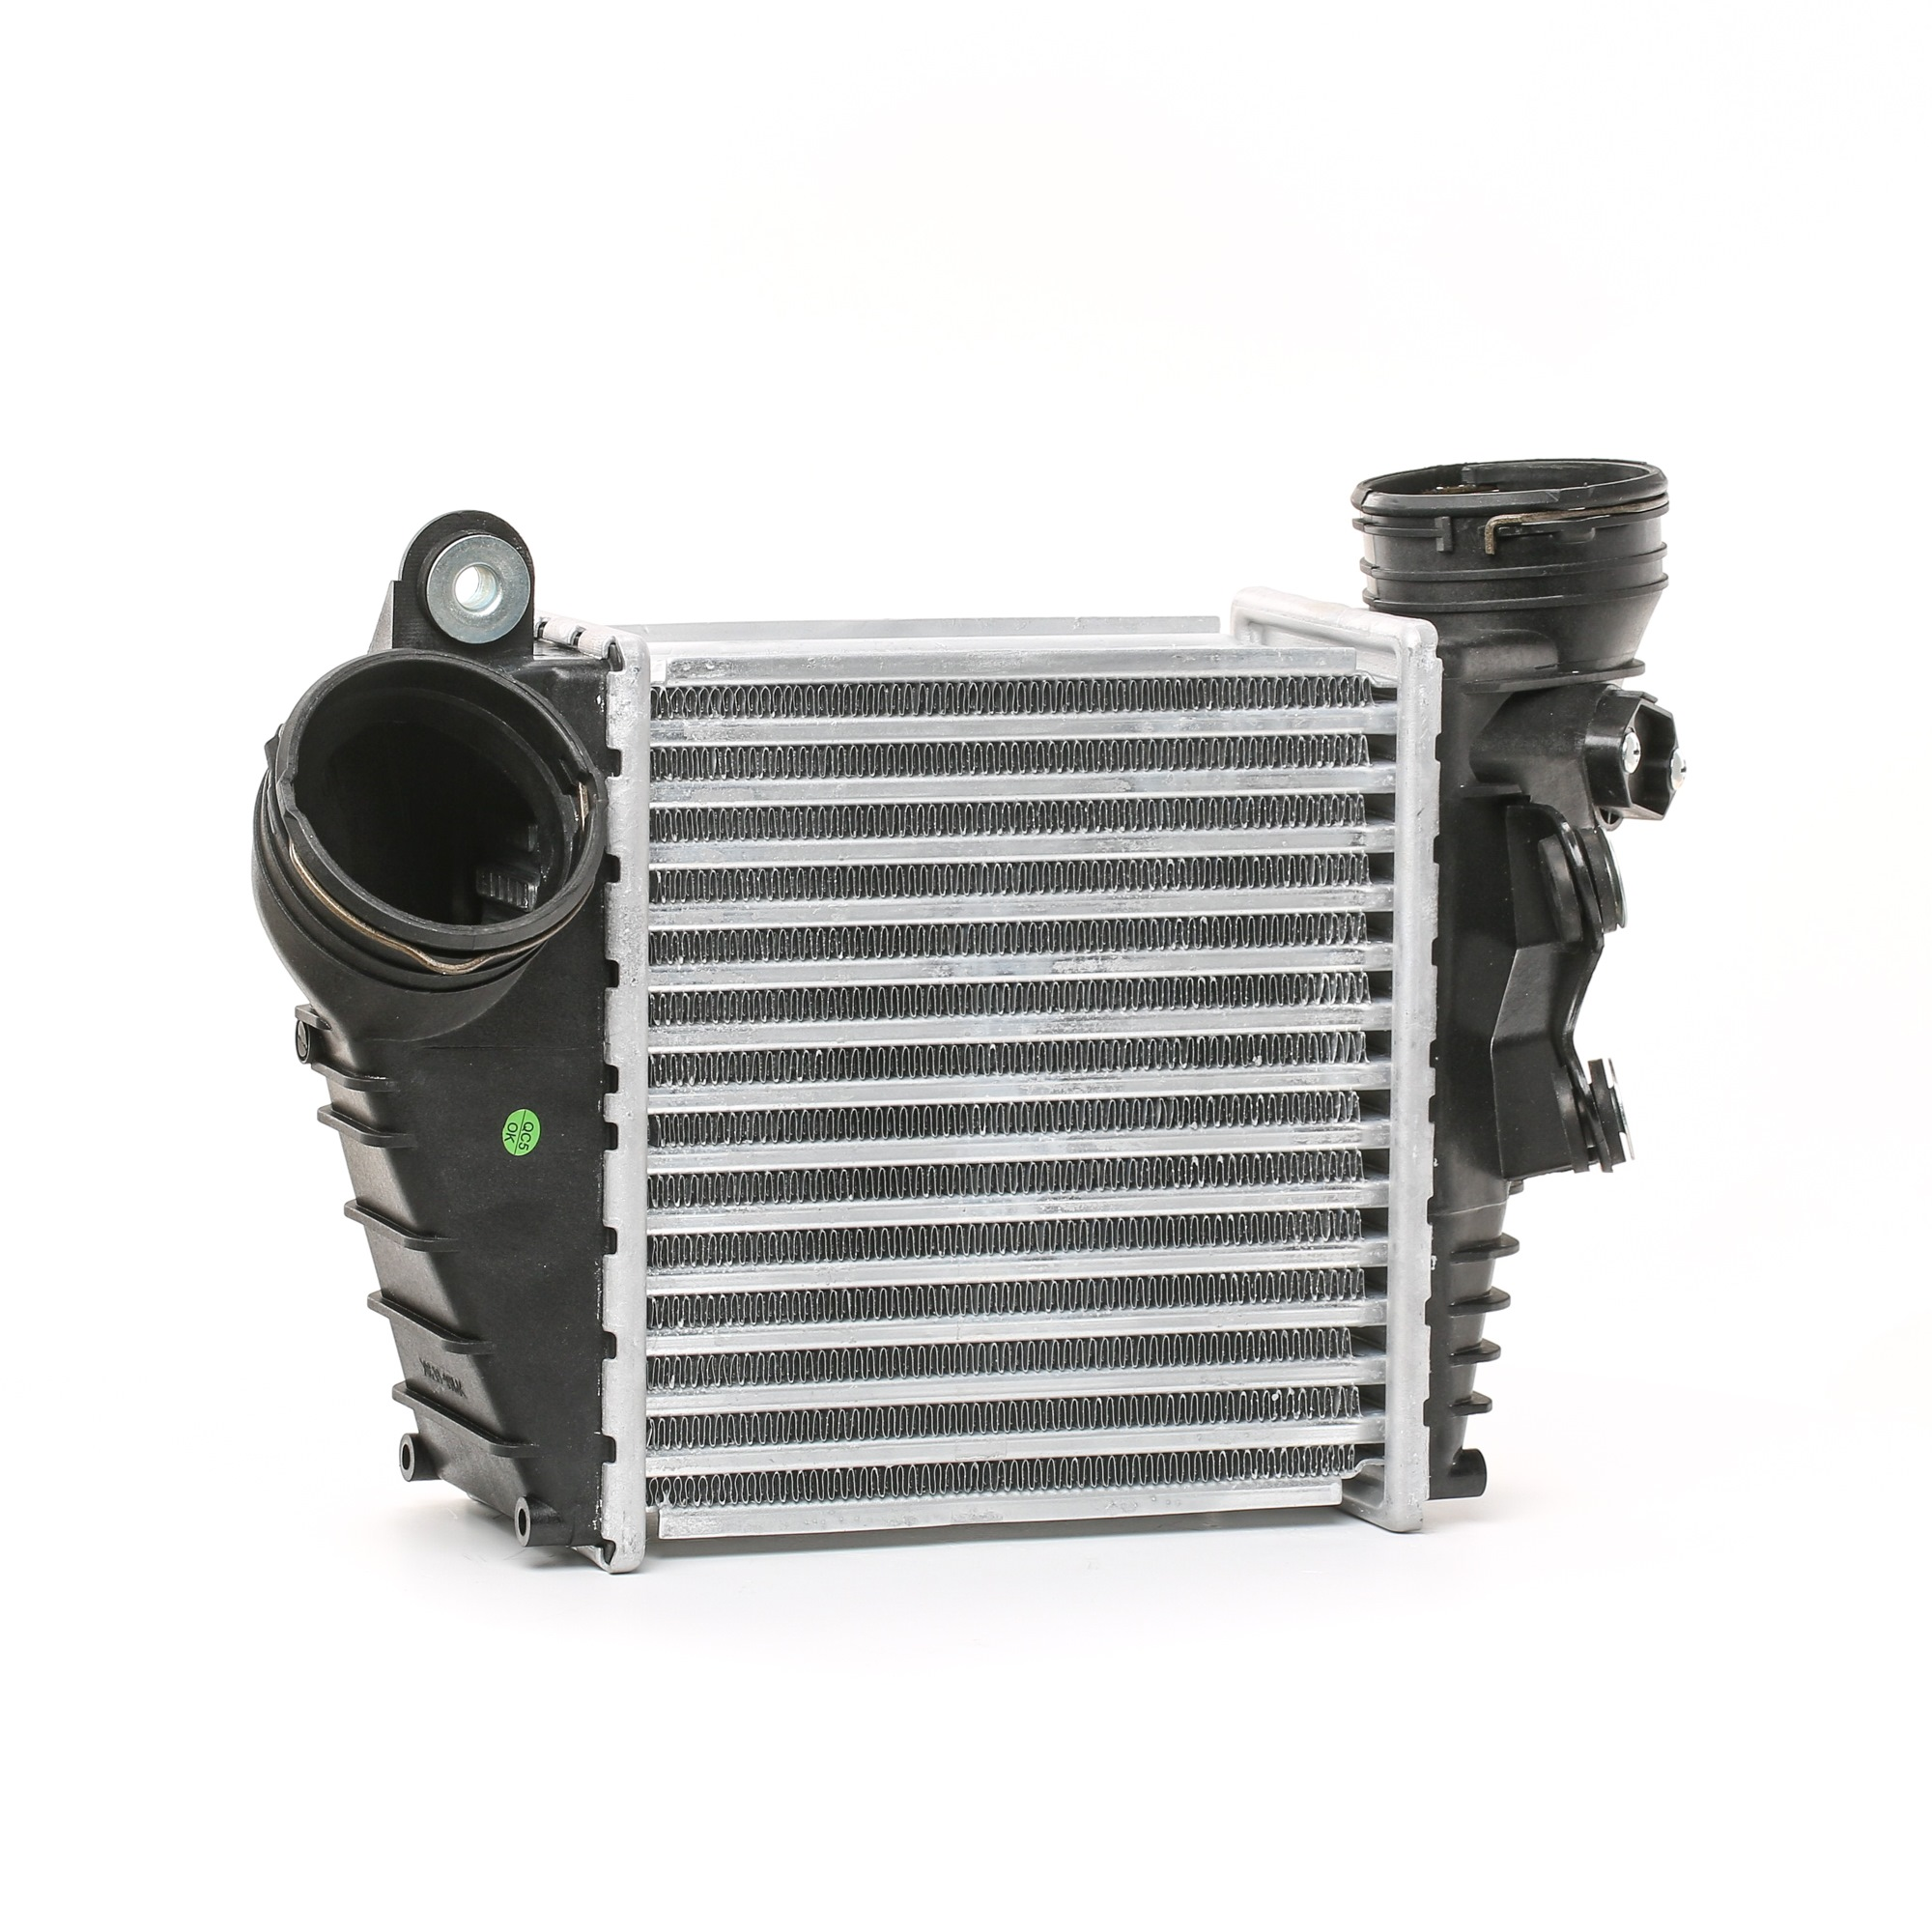 ridex Intercooler VW,AUDI,SKODA 468I0003 1J0145803E,1J0145803M,1J0145803E Interkoeler, tussenkoeler 1J0145803M,1J0145803E,1J0145803M